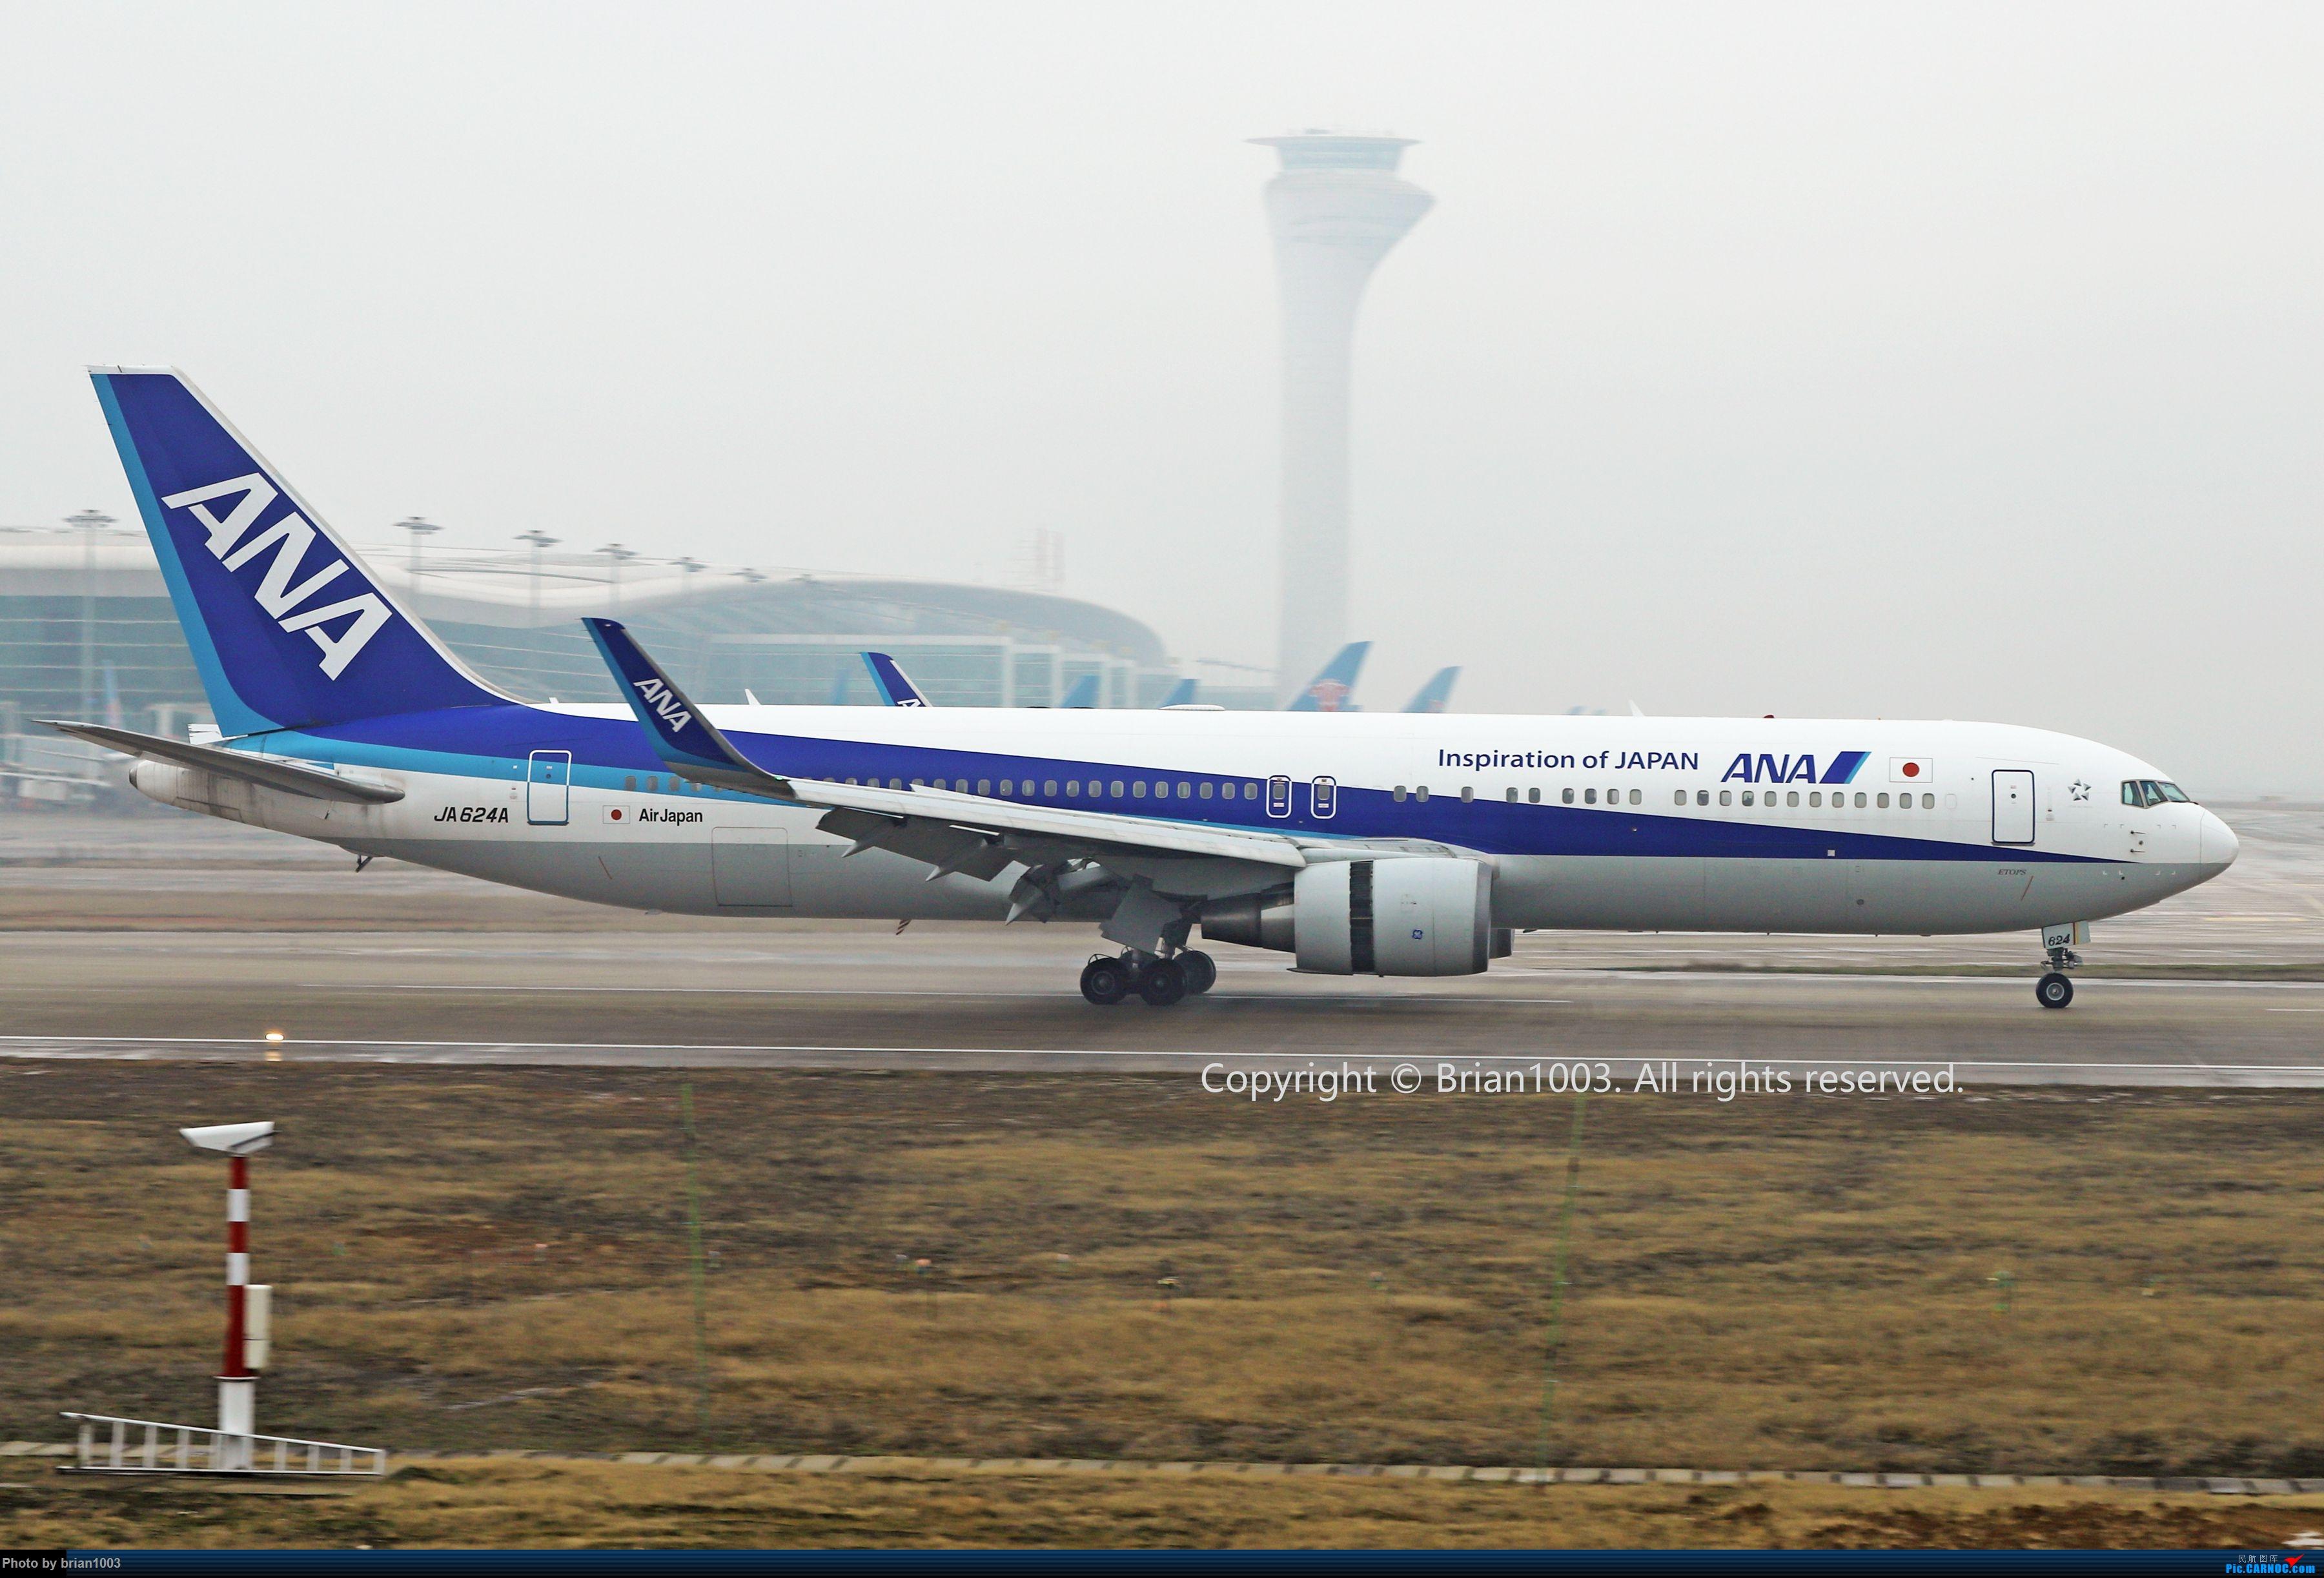 Re:[原创]WUH天河机场2021年拍机之二月 BOEING 767-300ER JA624A 中国武汉天河国际机场